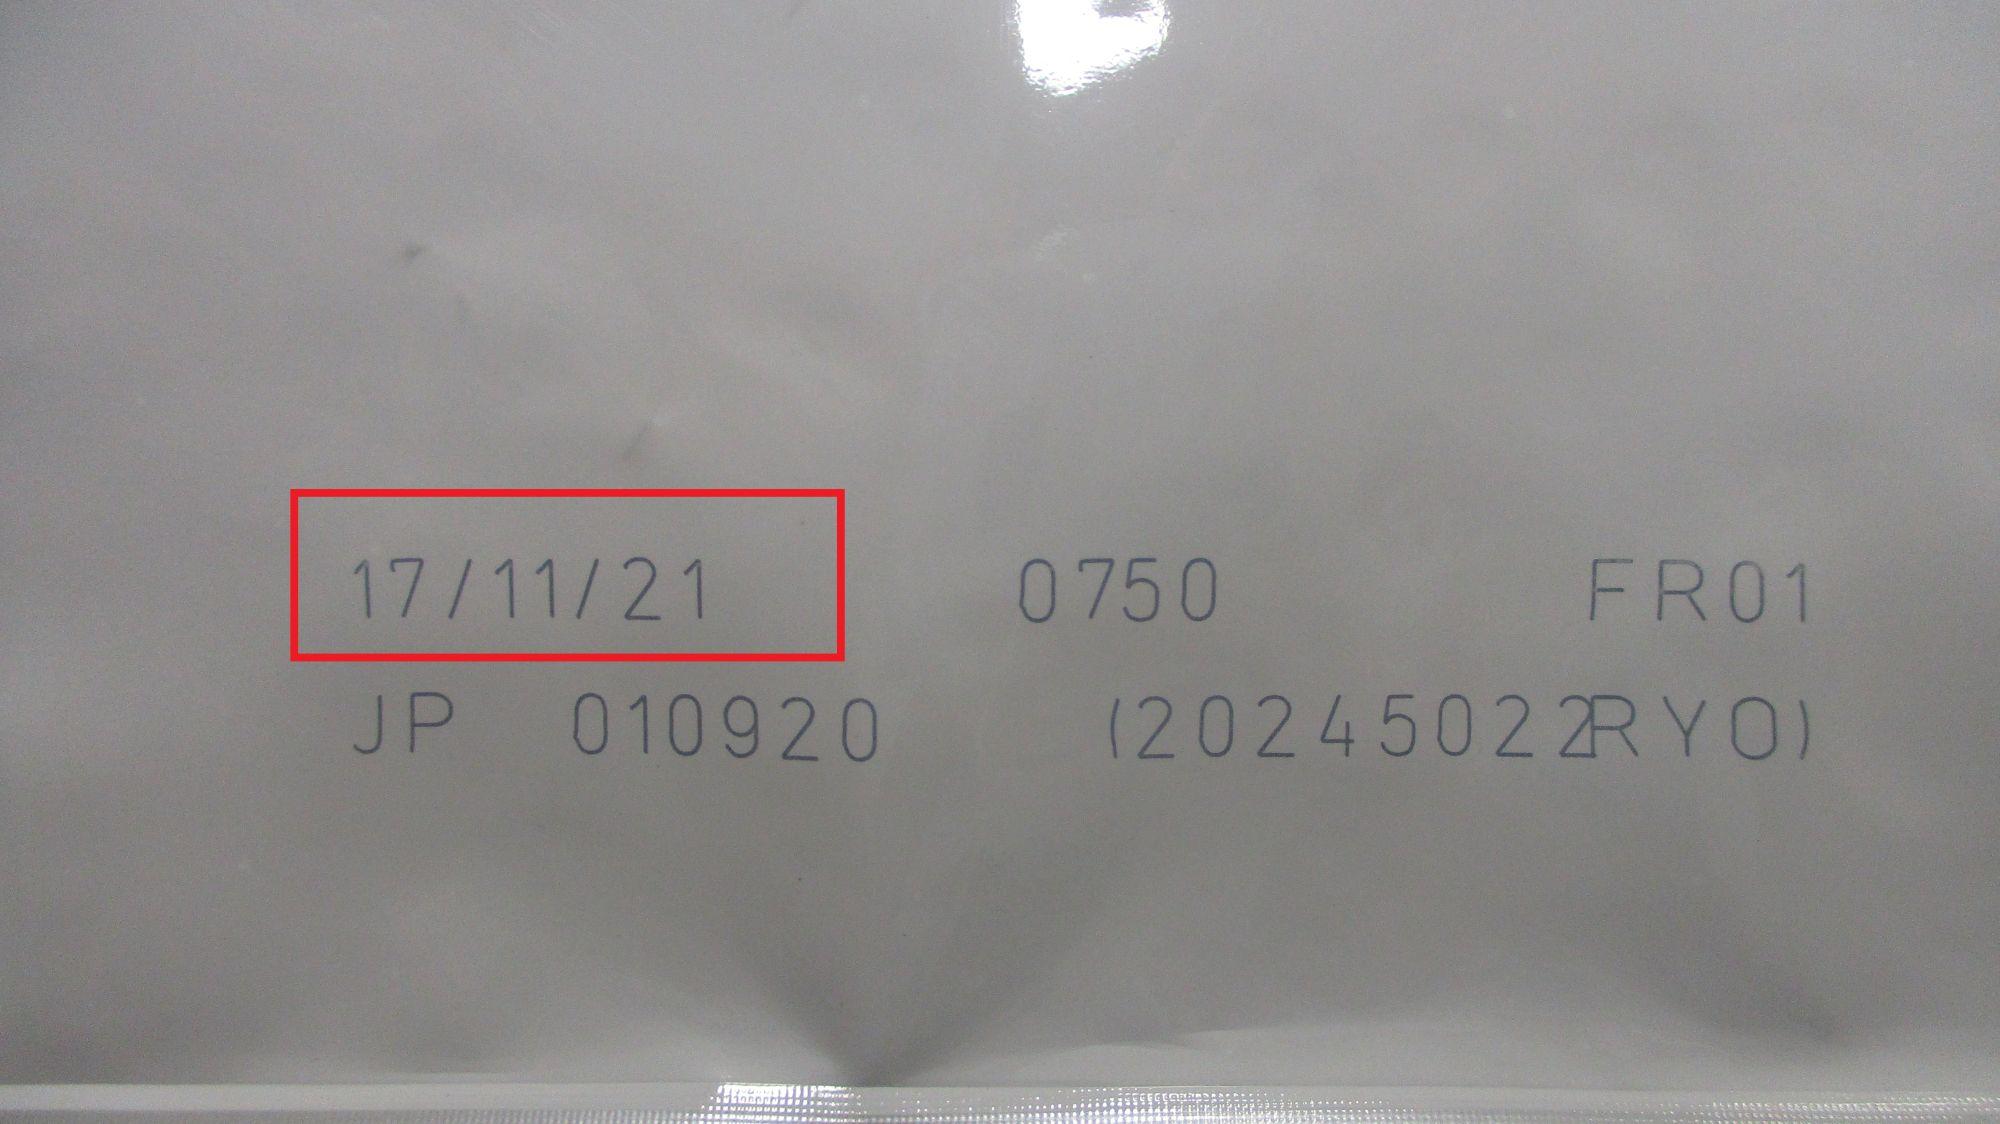 513-japan-local-packshot-of-medium-weight-care-expiration-date